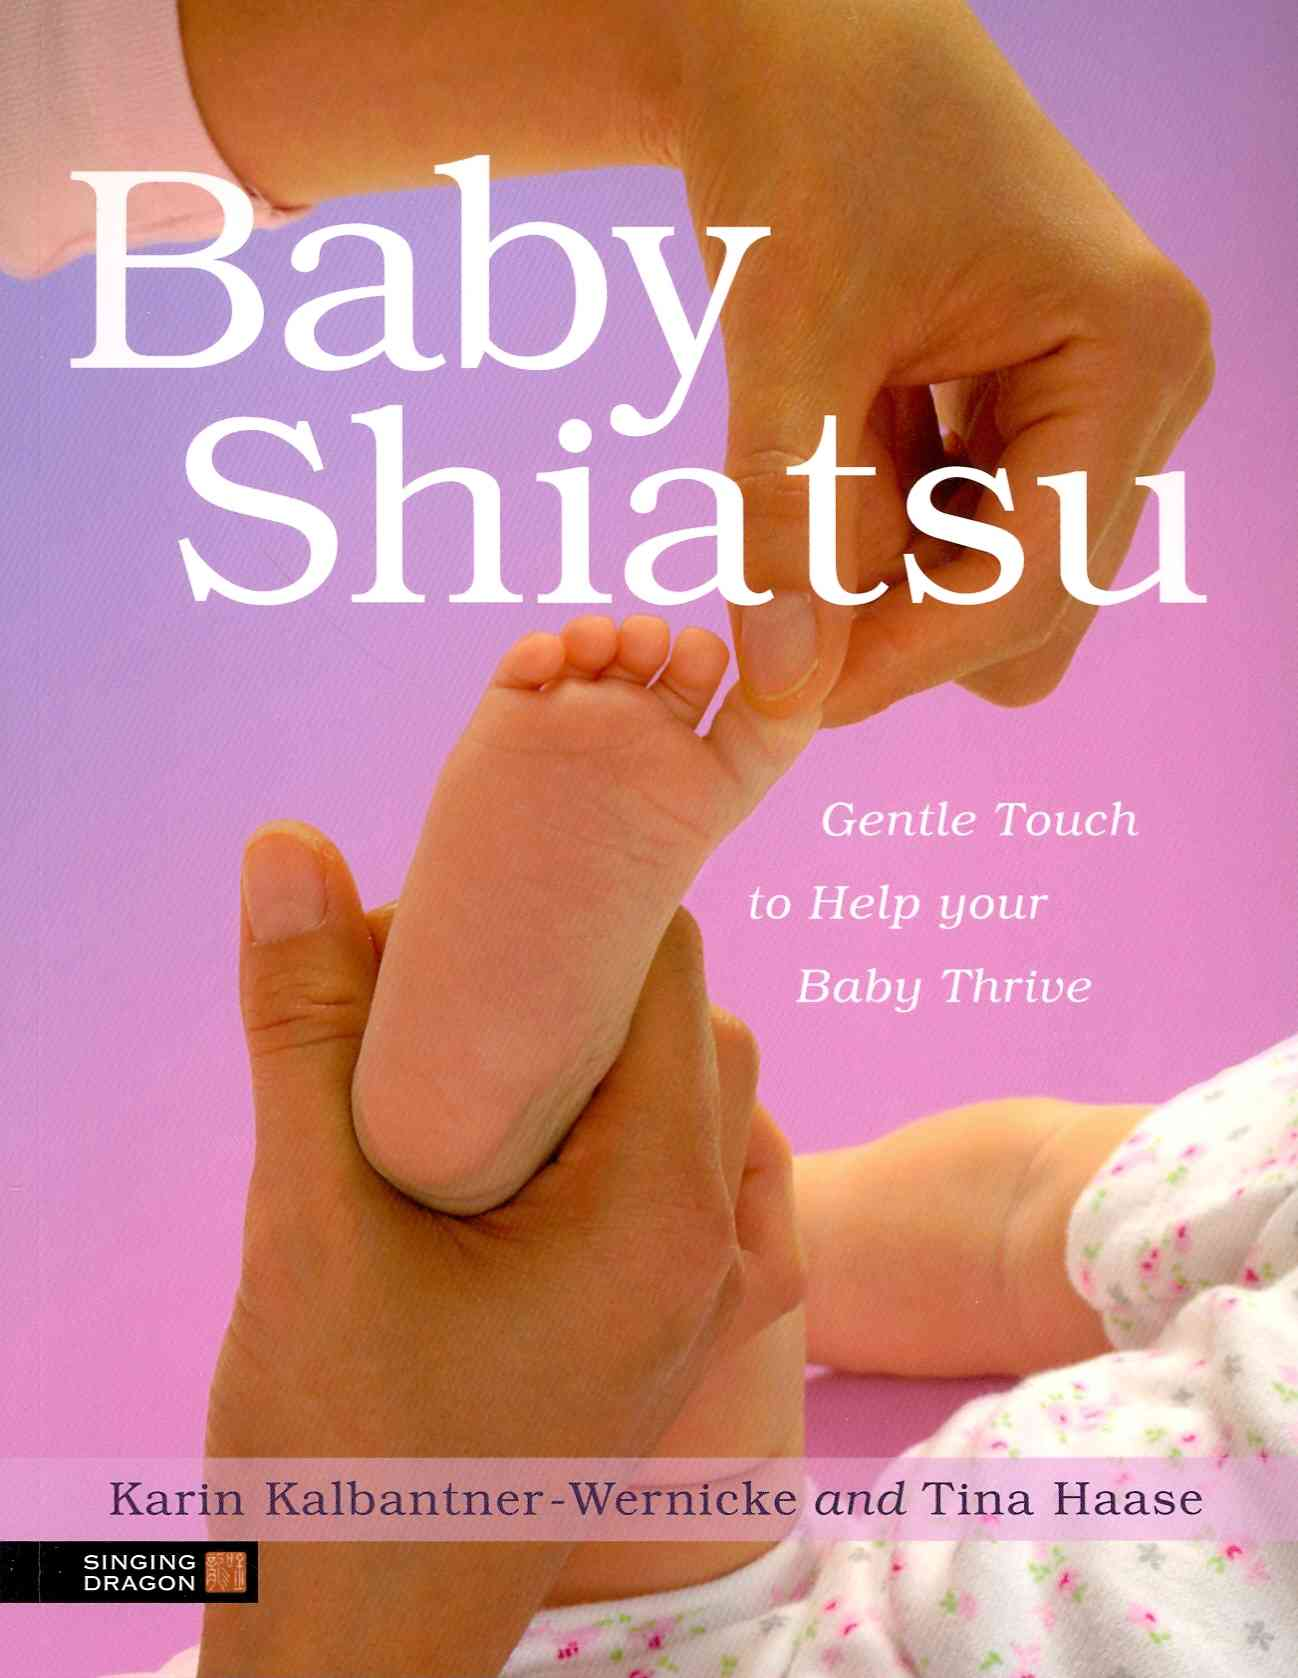 Baby Shiatsu By Kalbantner-wernicke, Karin/ Hasse, Tina